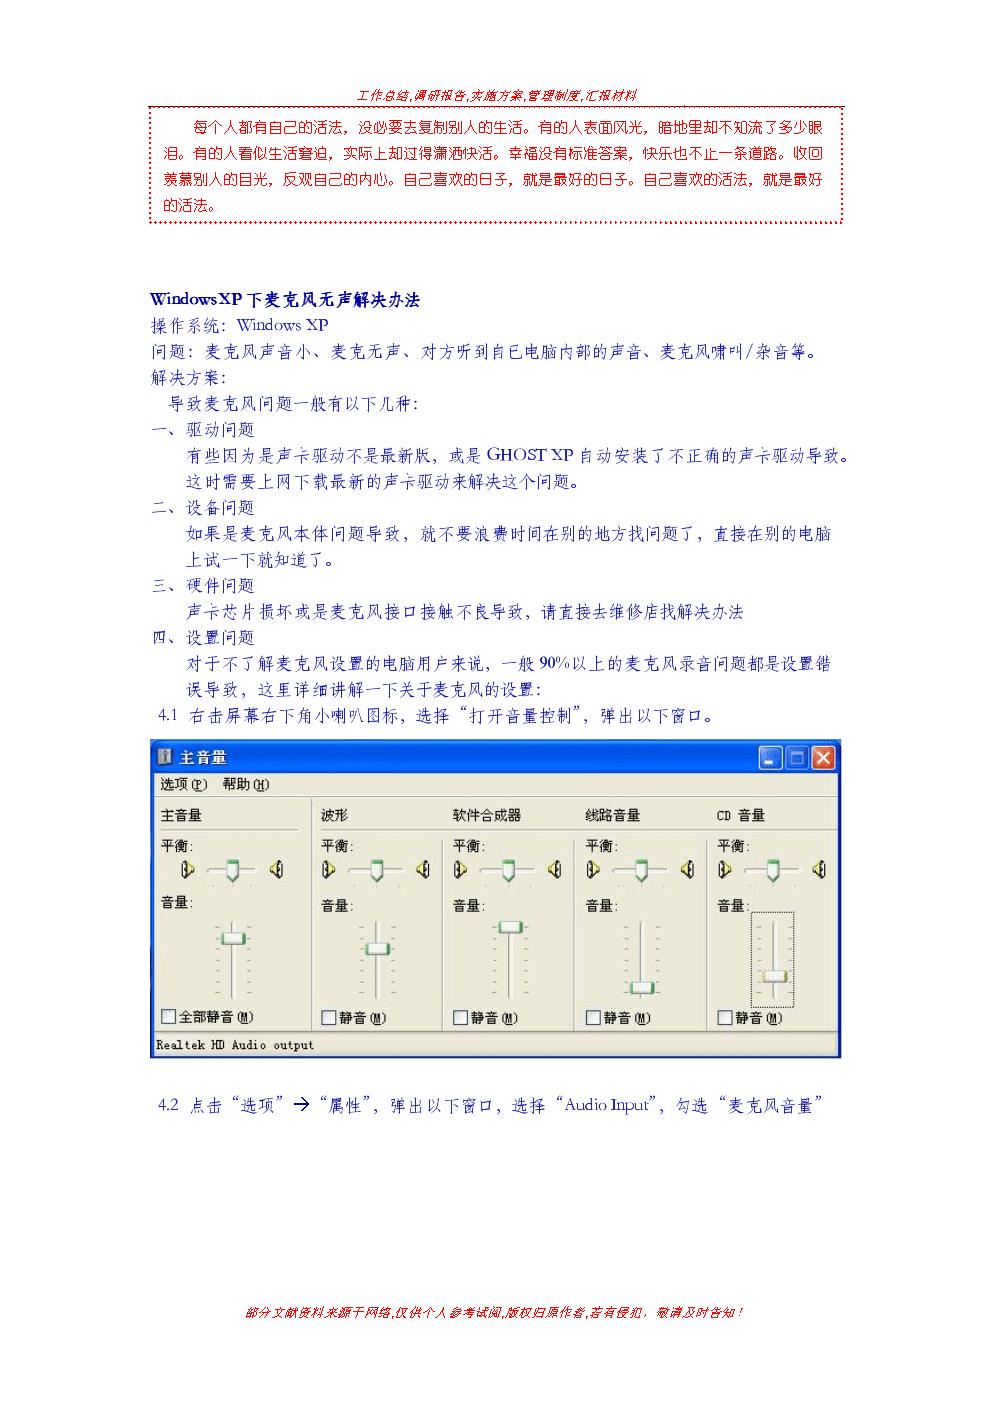 WIN XP麦克风无声解决方法.doc